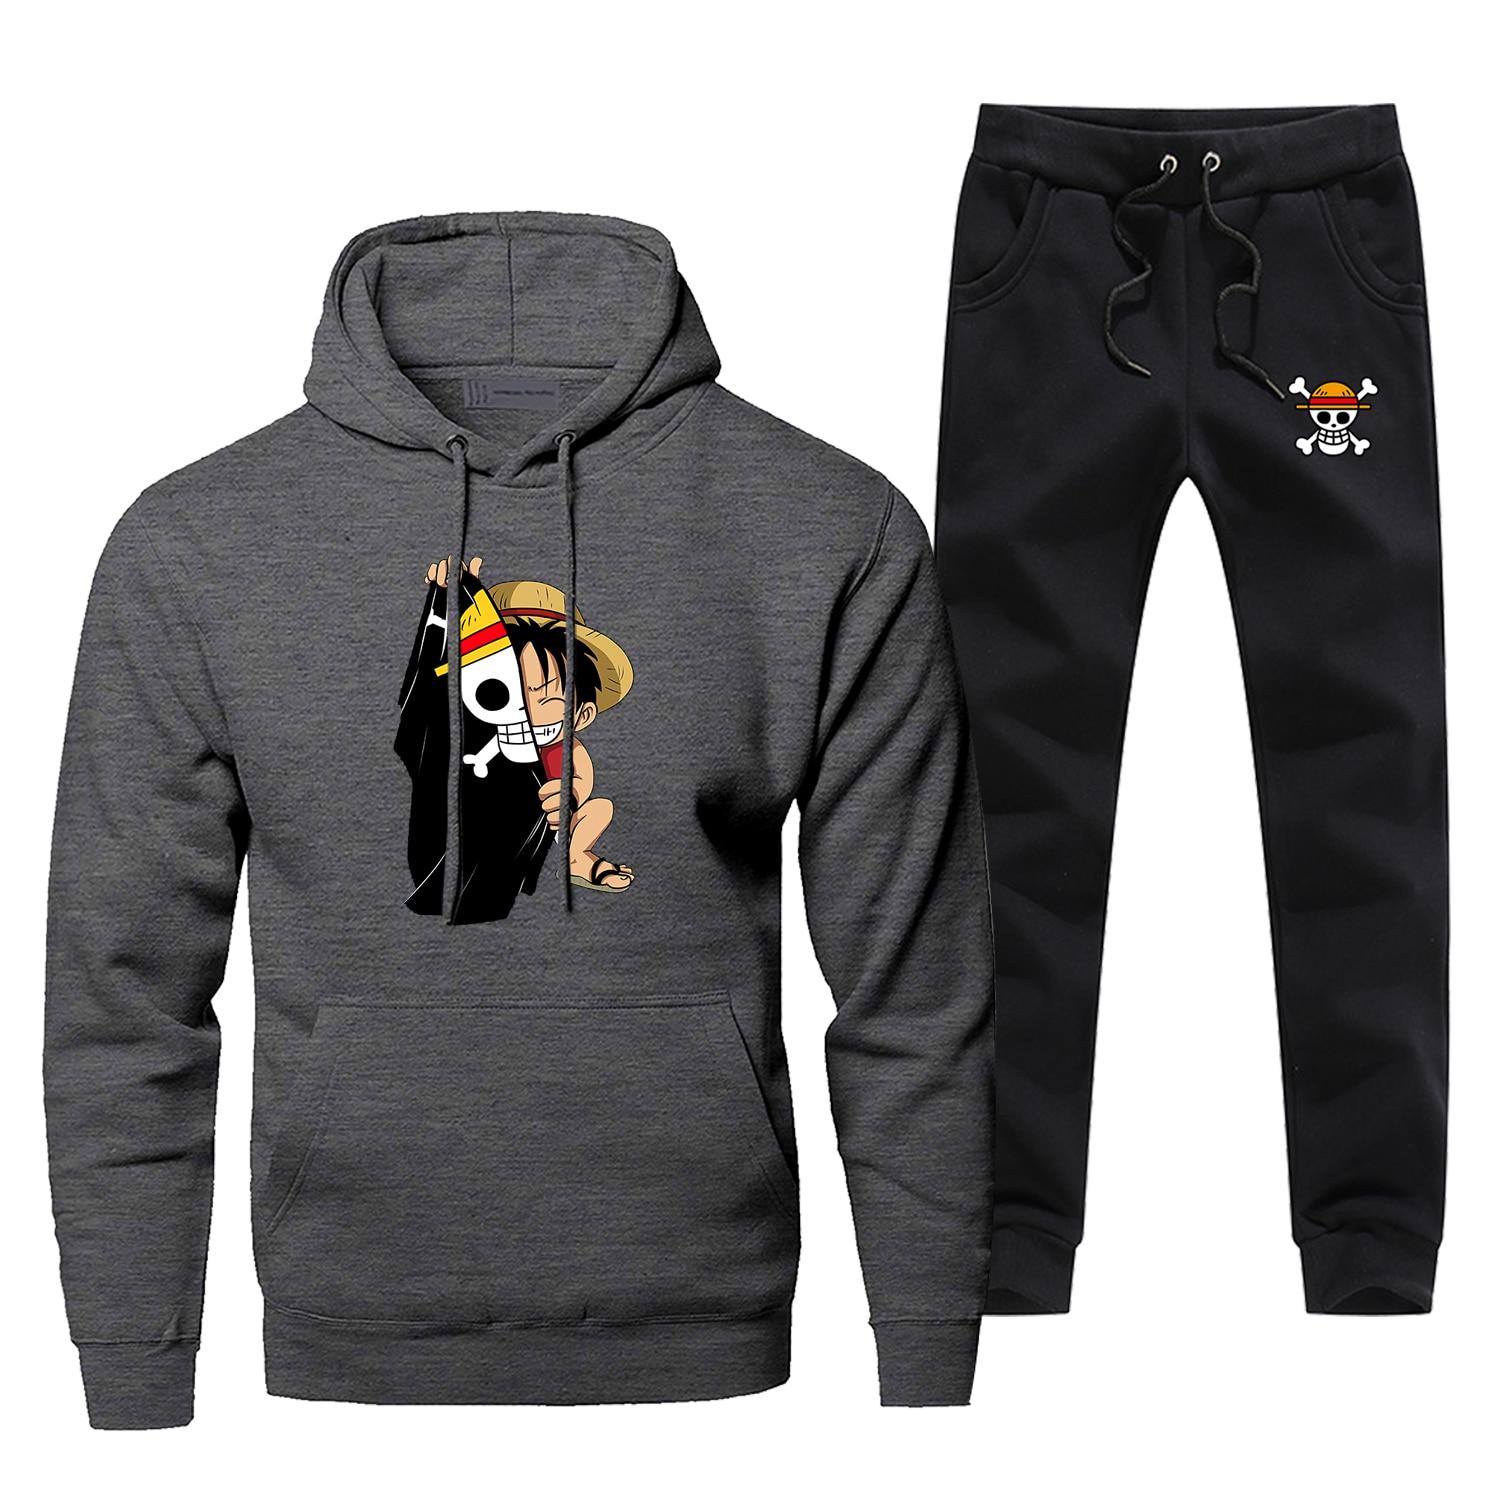 One Peice Monkey D Luffy Flage Men's Jogging 2019 Winter 2 Piece Set Japan Anime Harajuku Men's Sets Fleece Casual Warm Hoodies